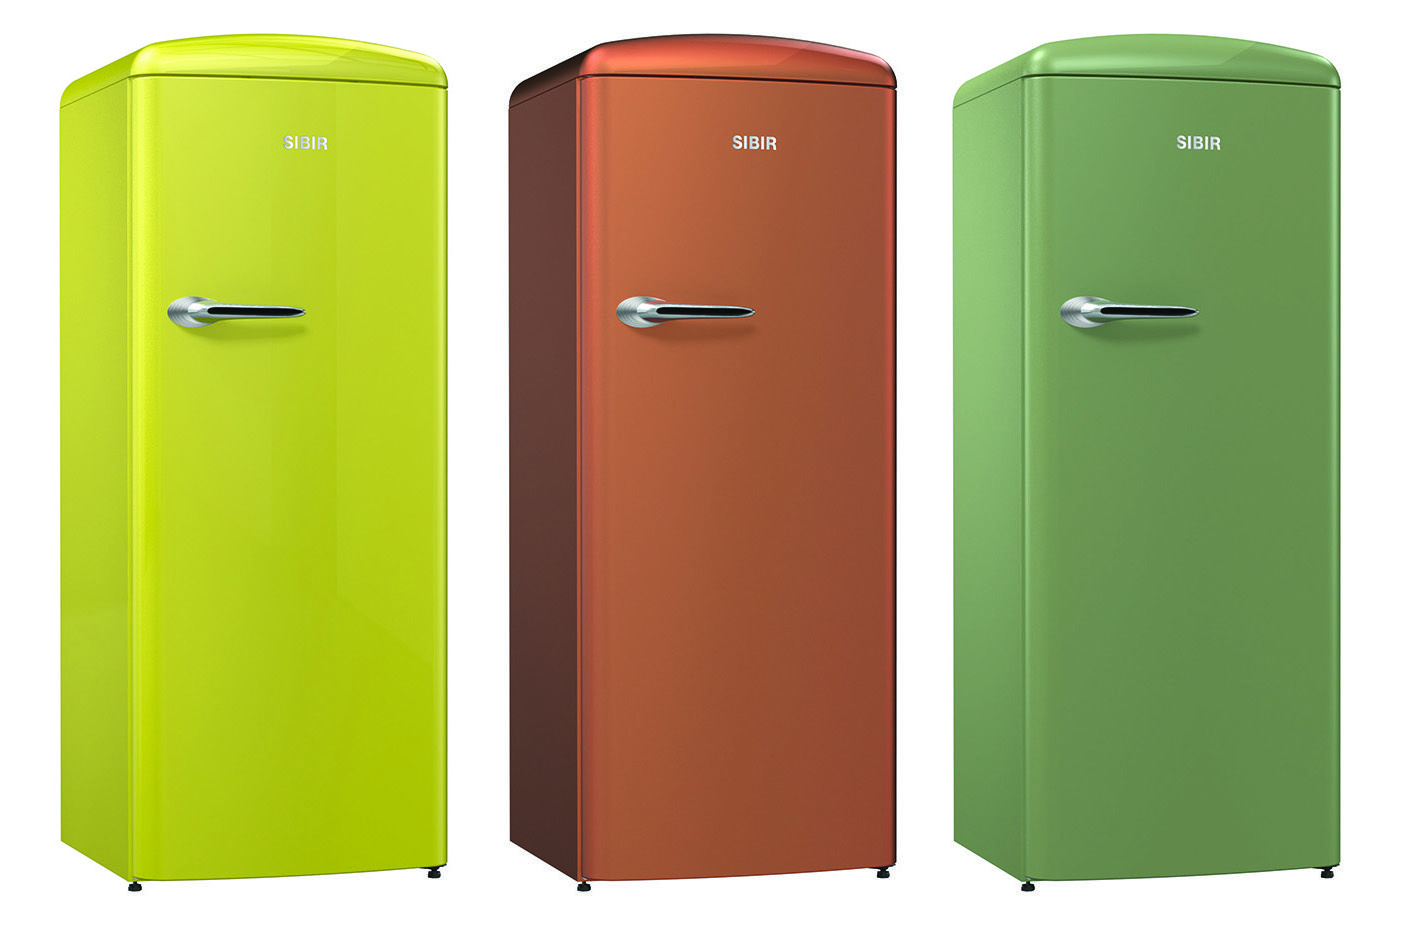 Retro Kühlschrank Umbauen : Kühlschrank umbauen kühlschrank umbau bauanleitung zum